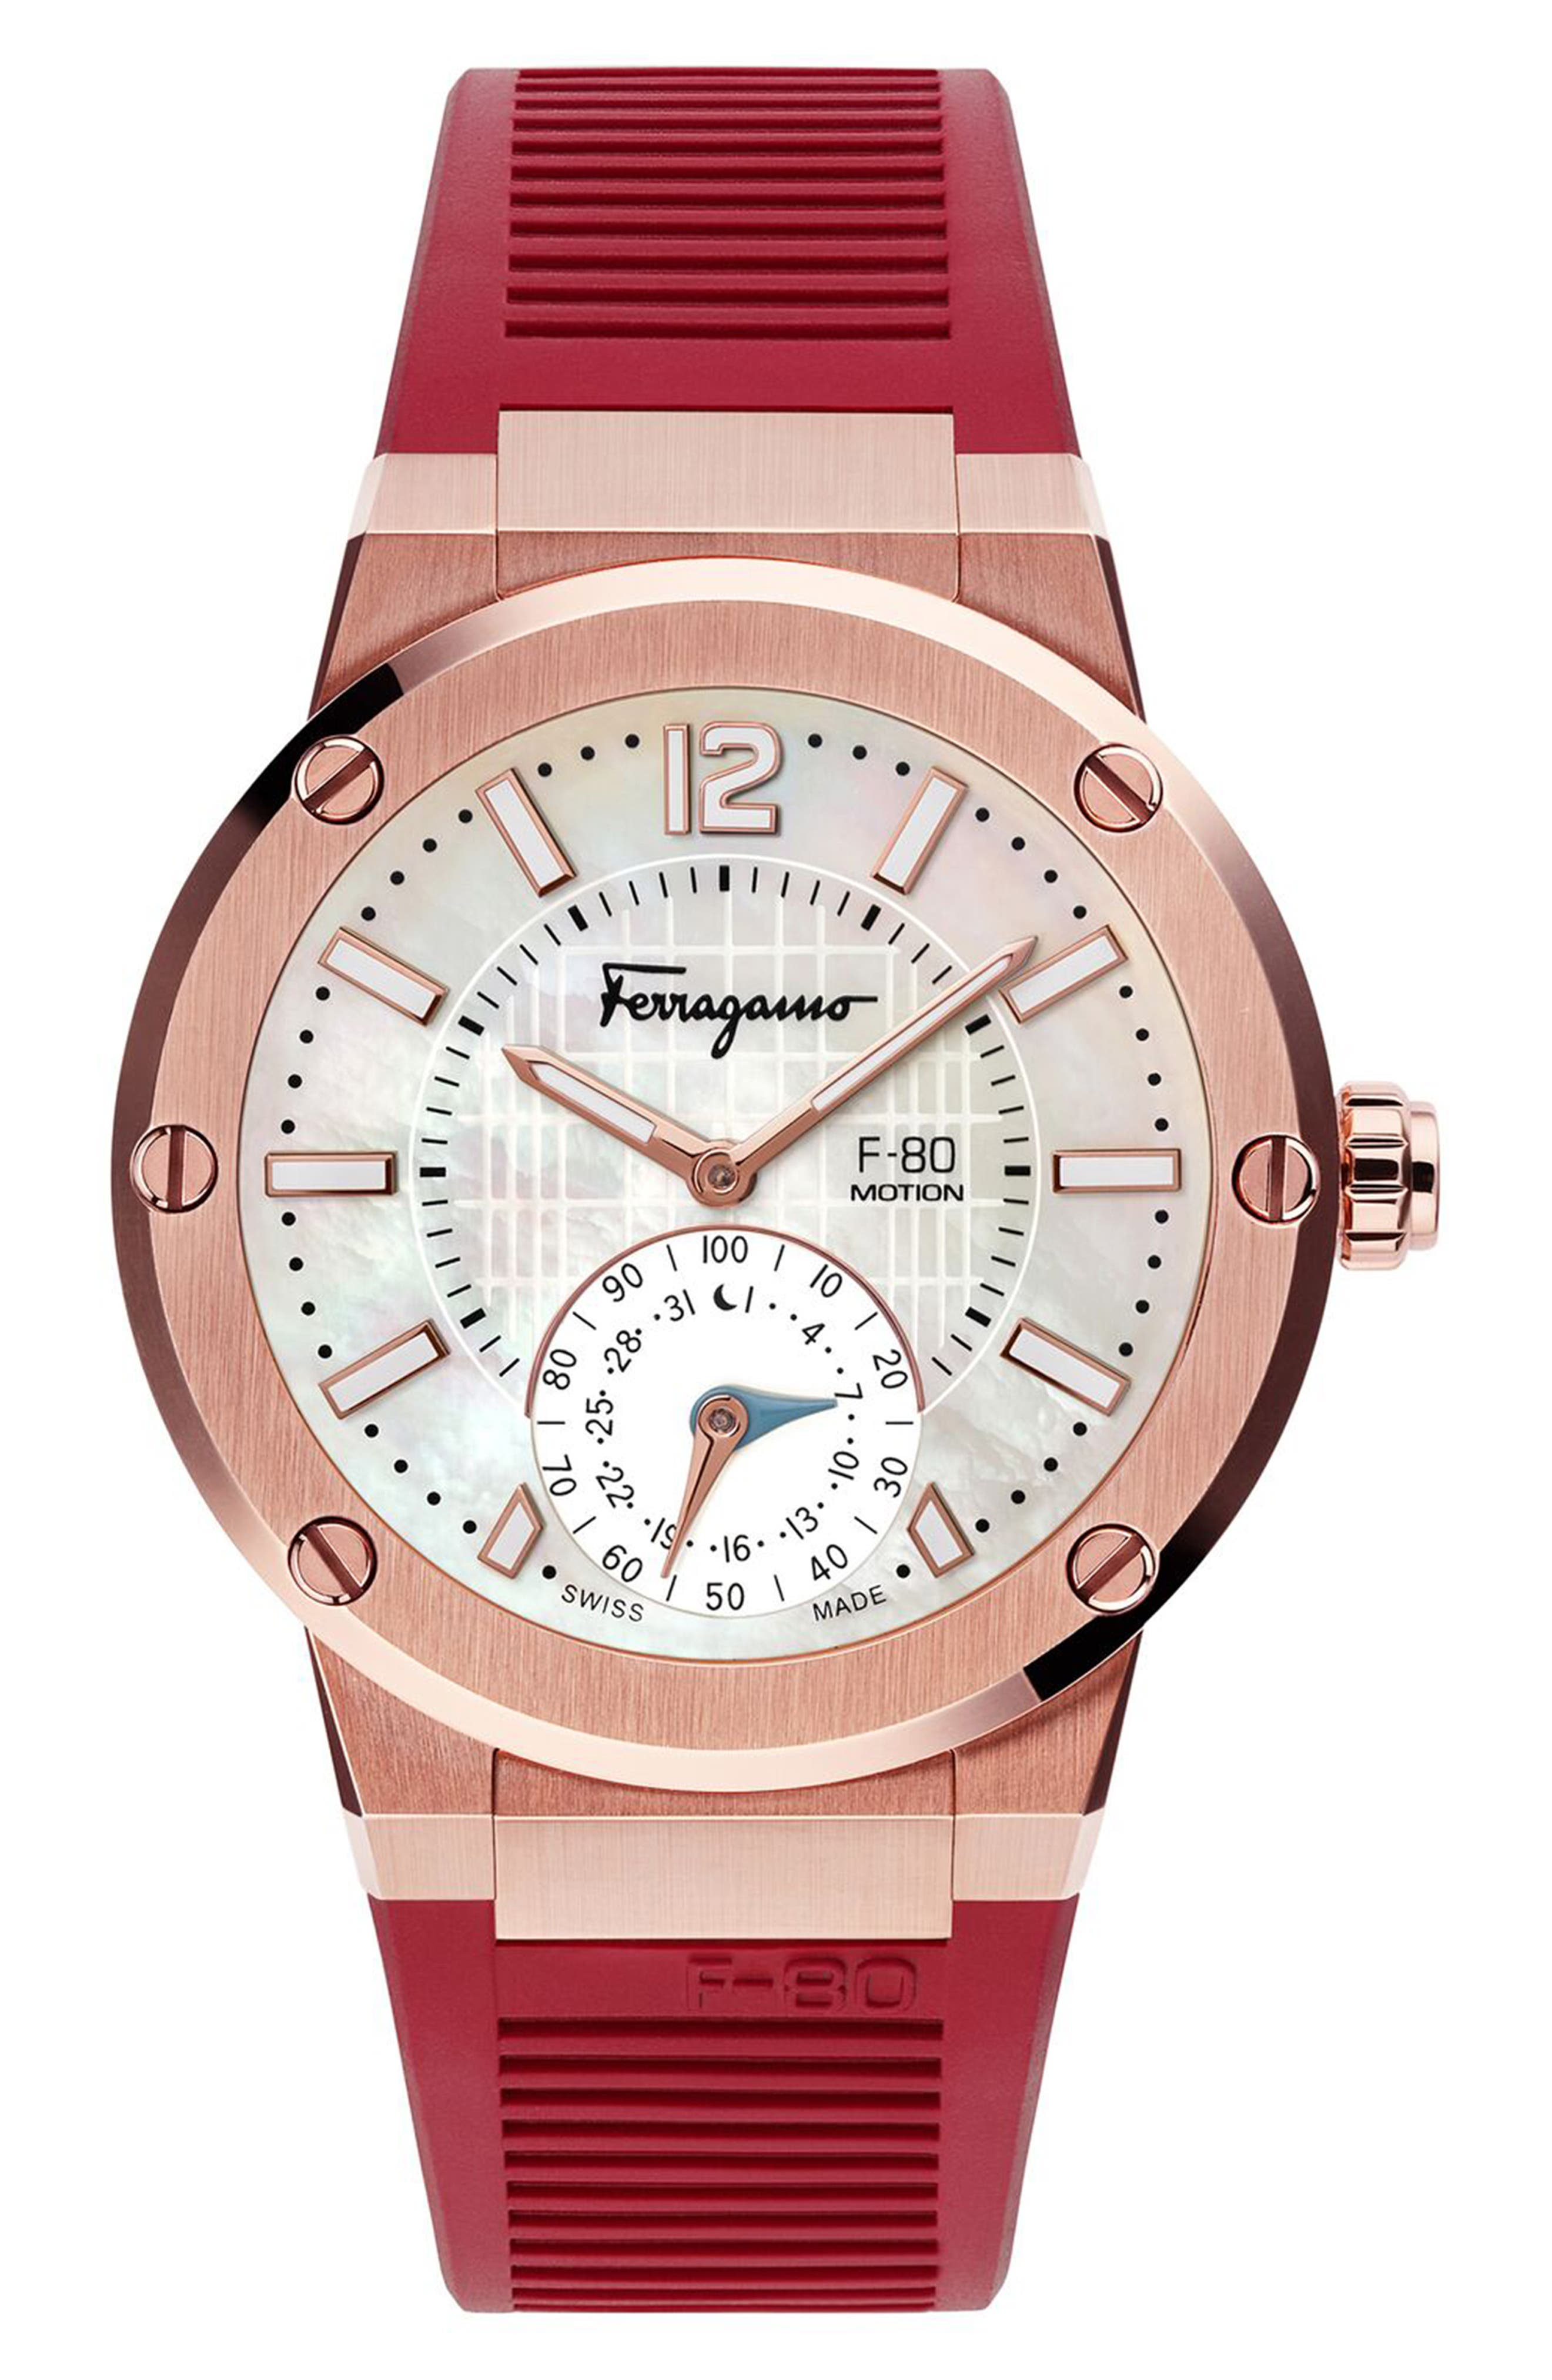 SALVATORE FERRAGAMO, F-80 Motion Rubber Strap Smart Watch, 44mm, Alternate thumbnail 3, color, BURGUNDY/ WHITE MOP/ ROSE GOLD